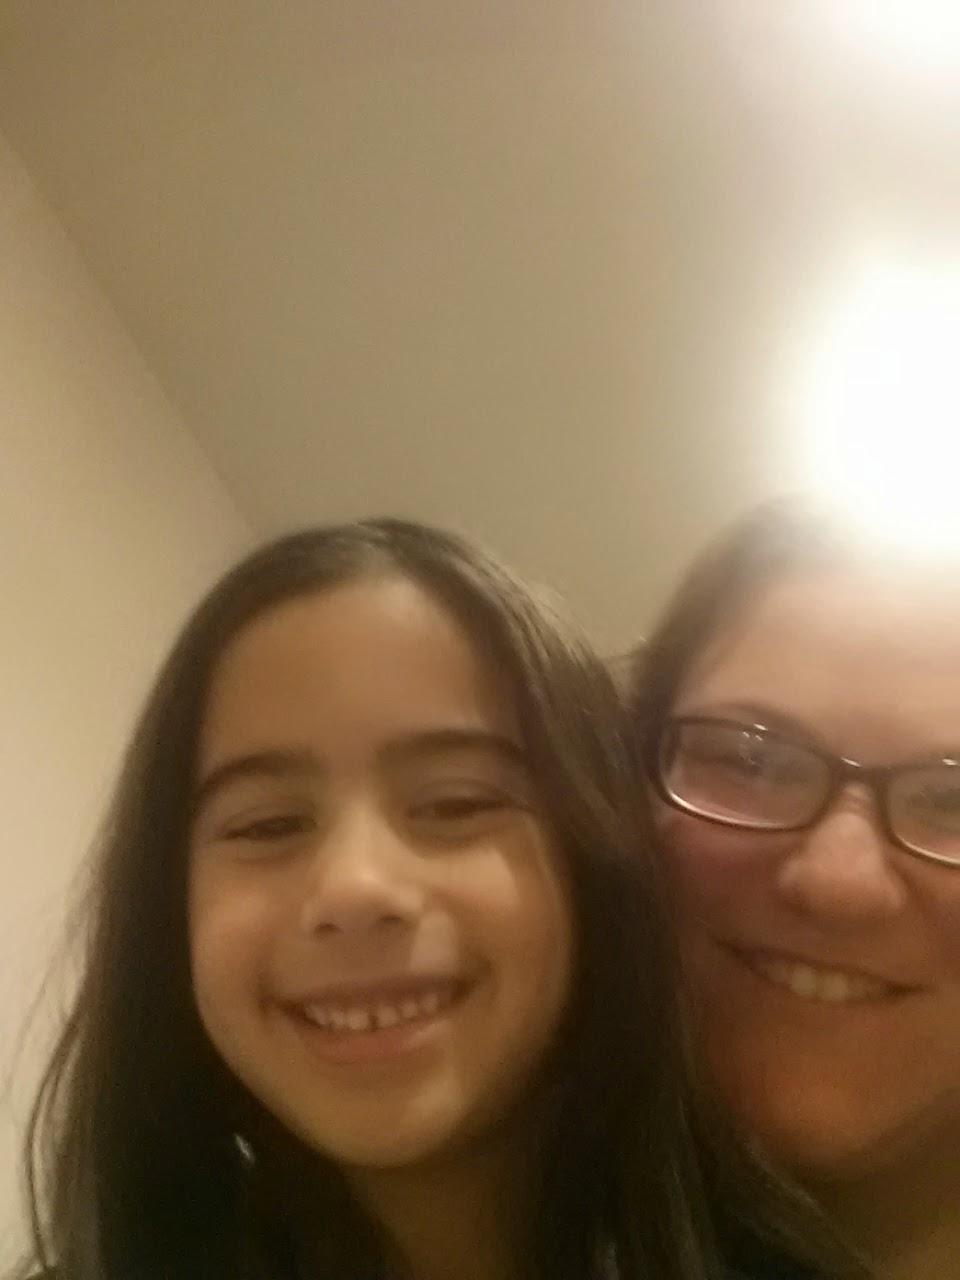 Selfie with my niece Sam. Happy we were reunited!